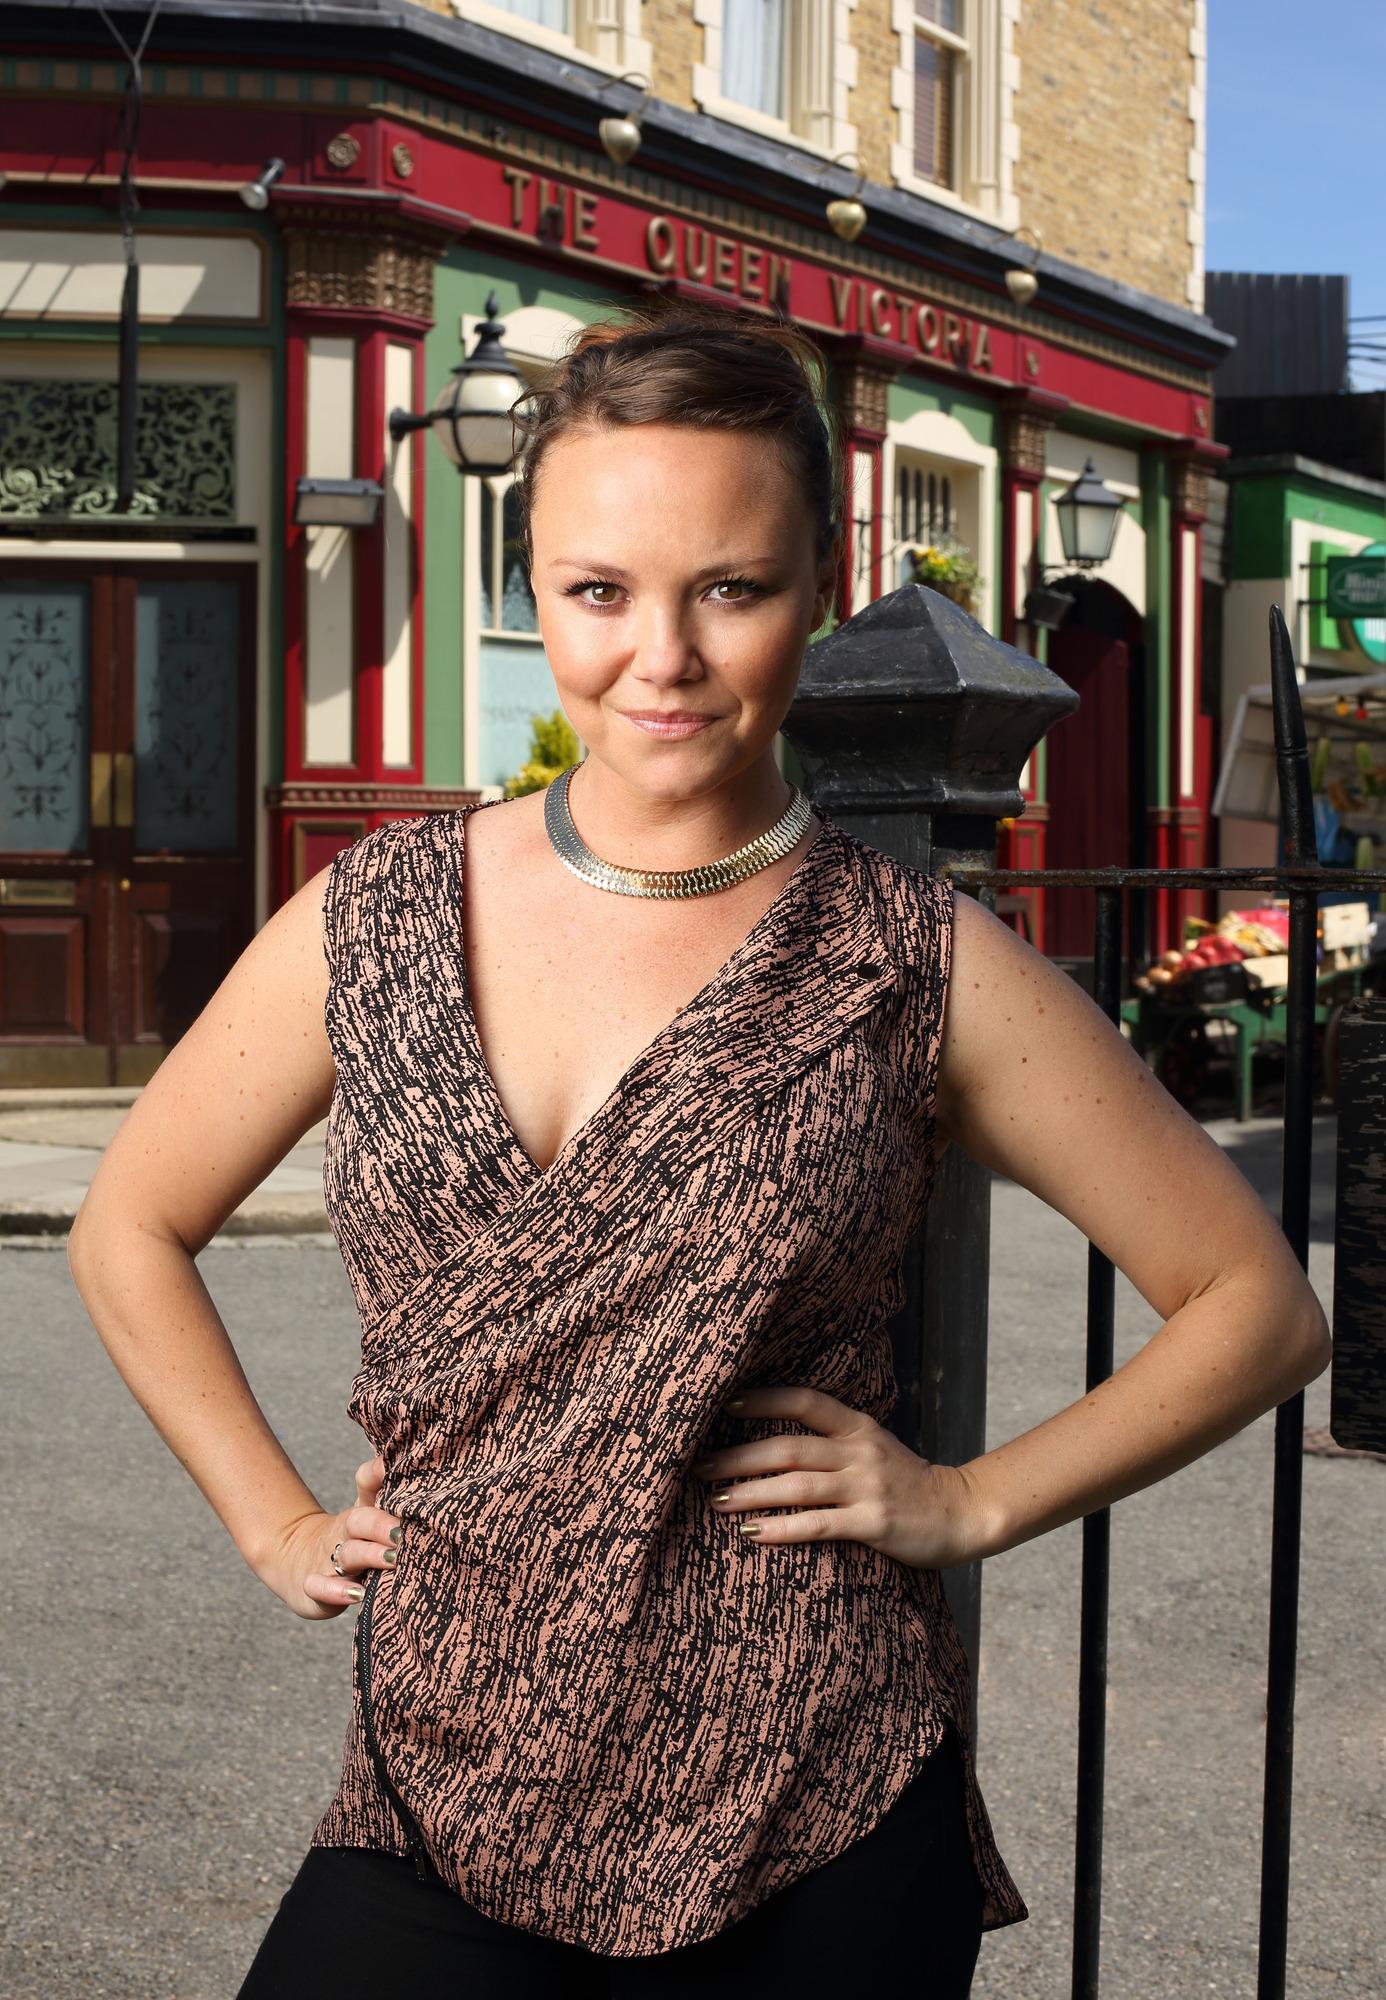 EastEnders Christmas special 2013: Janine Butcher